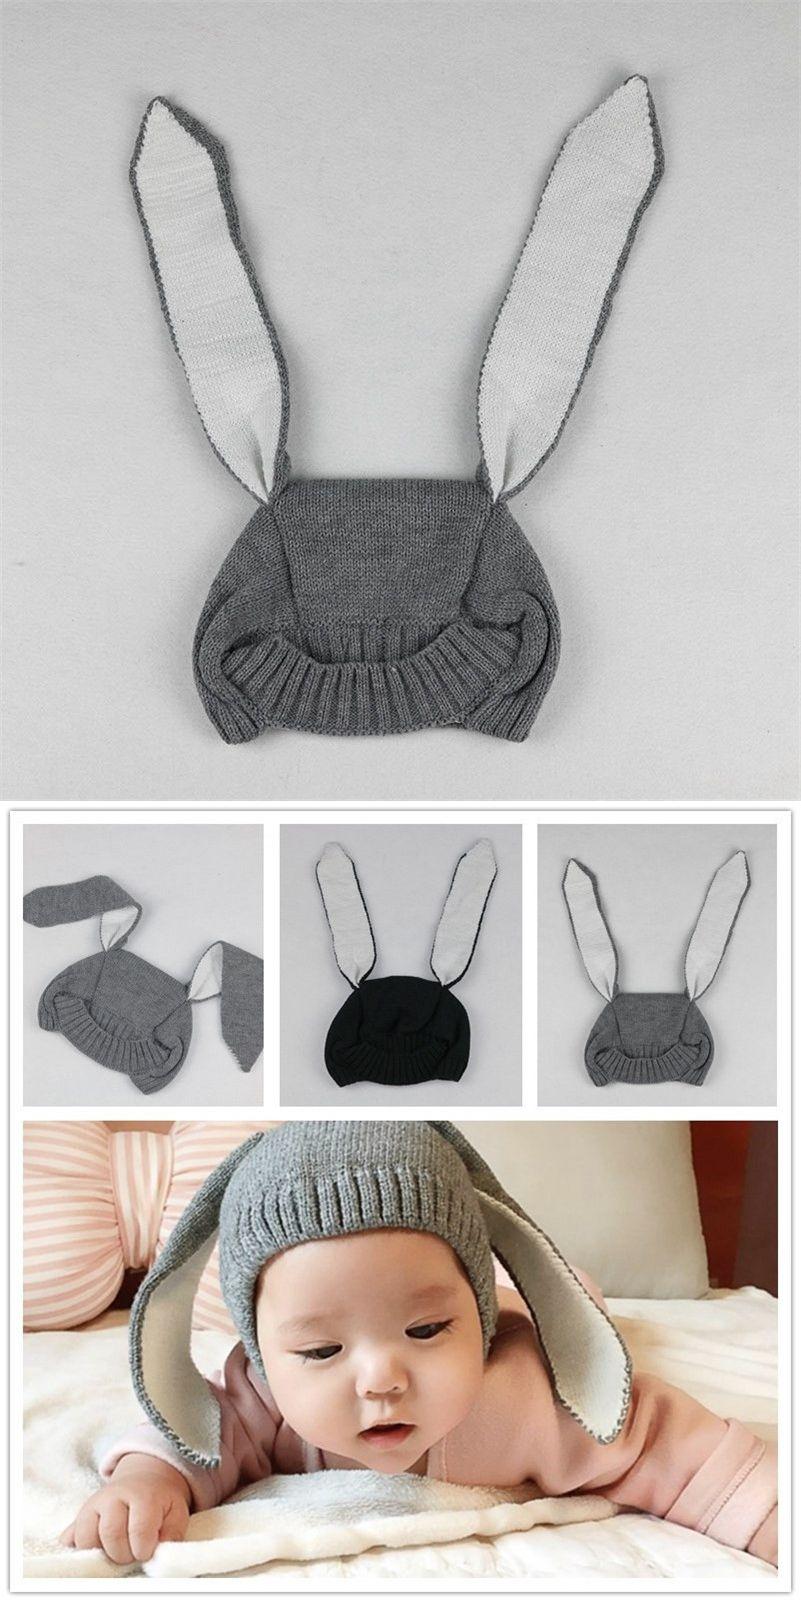 152bb51c551 2016 Newborn Baby Caps Photography Props Cute Rabbit Ears Hats Costume  Crochet Knitting Winter Hat Infant